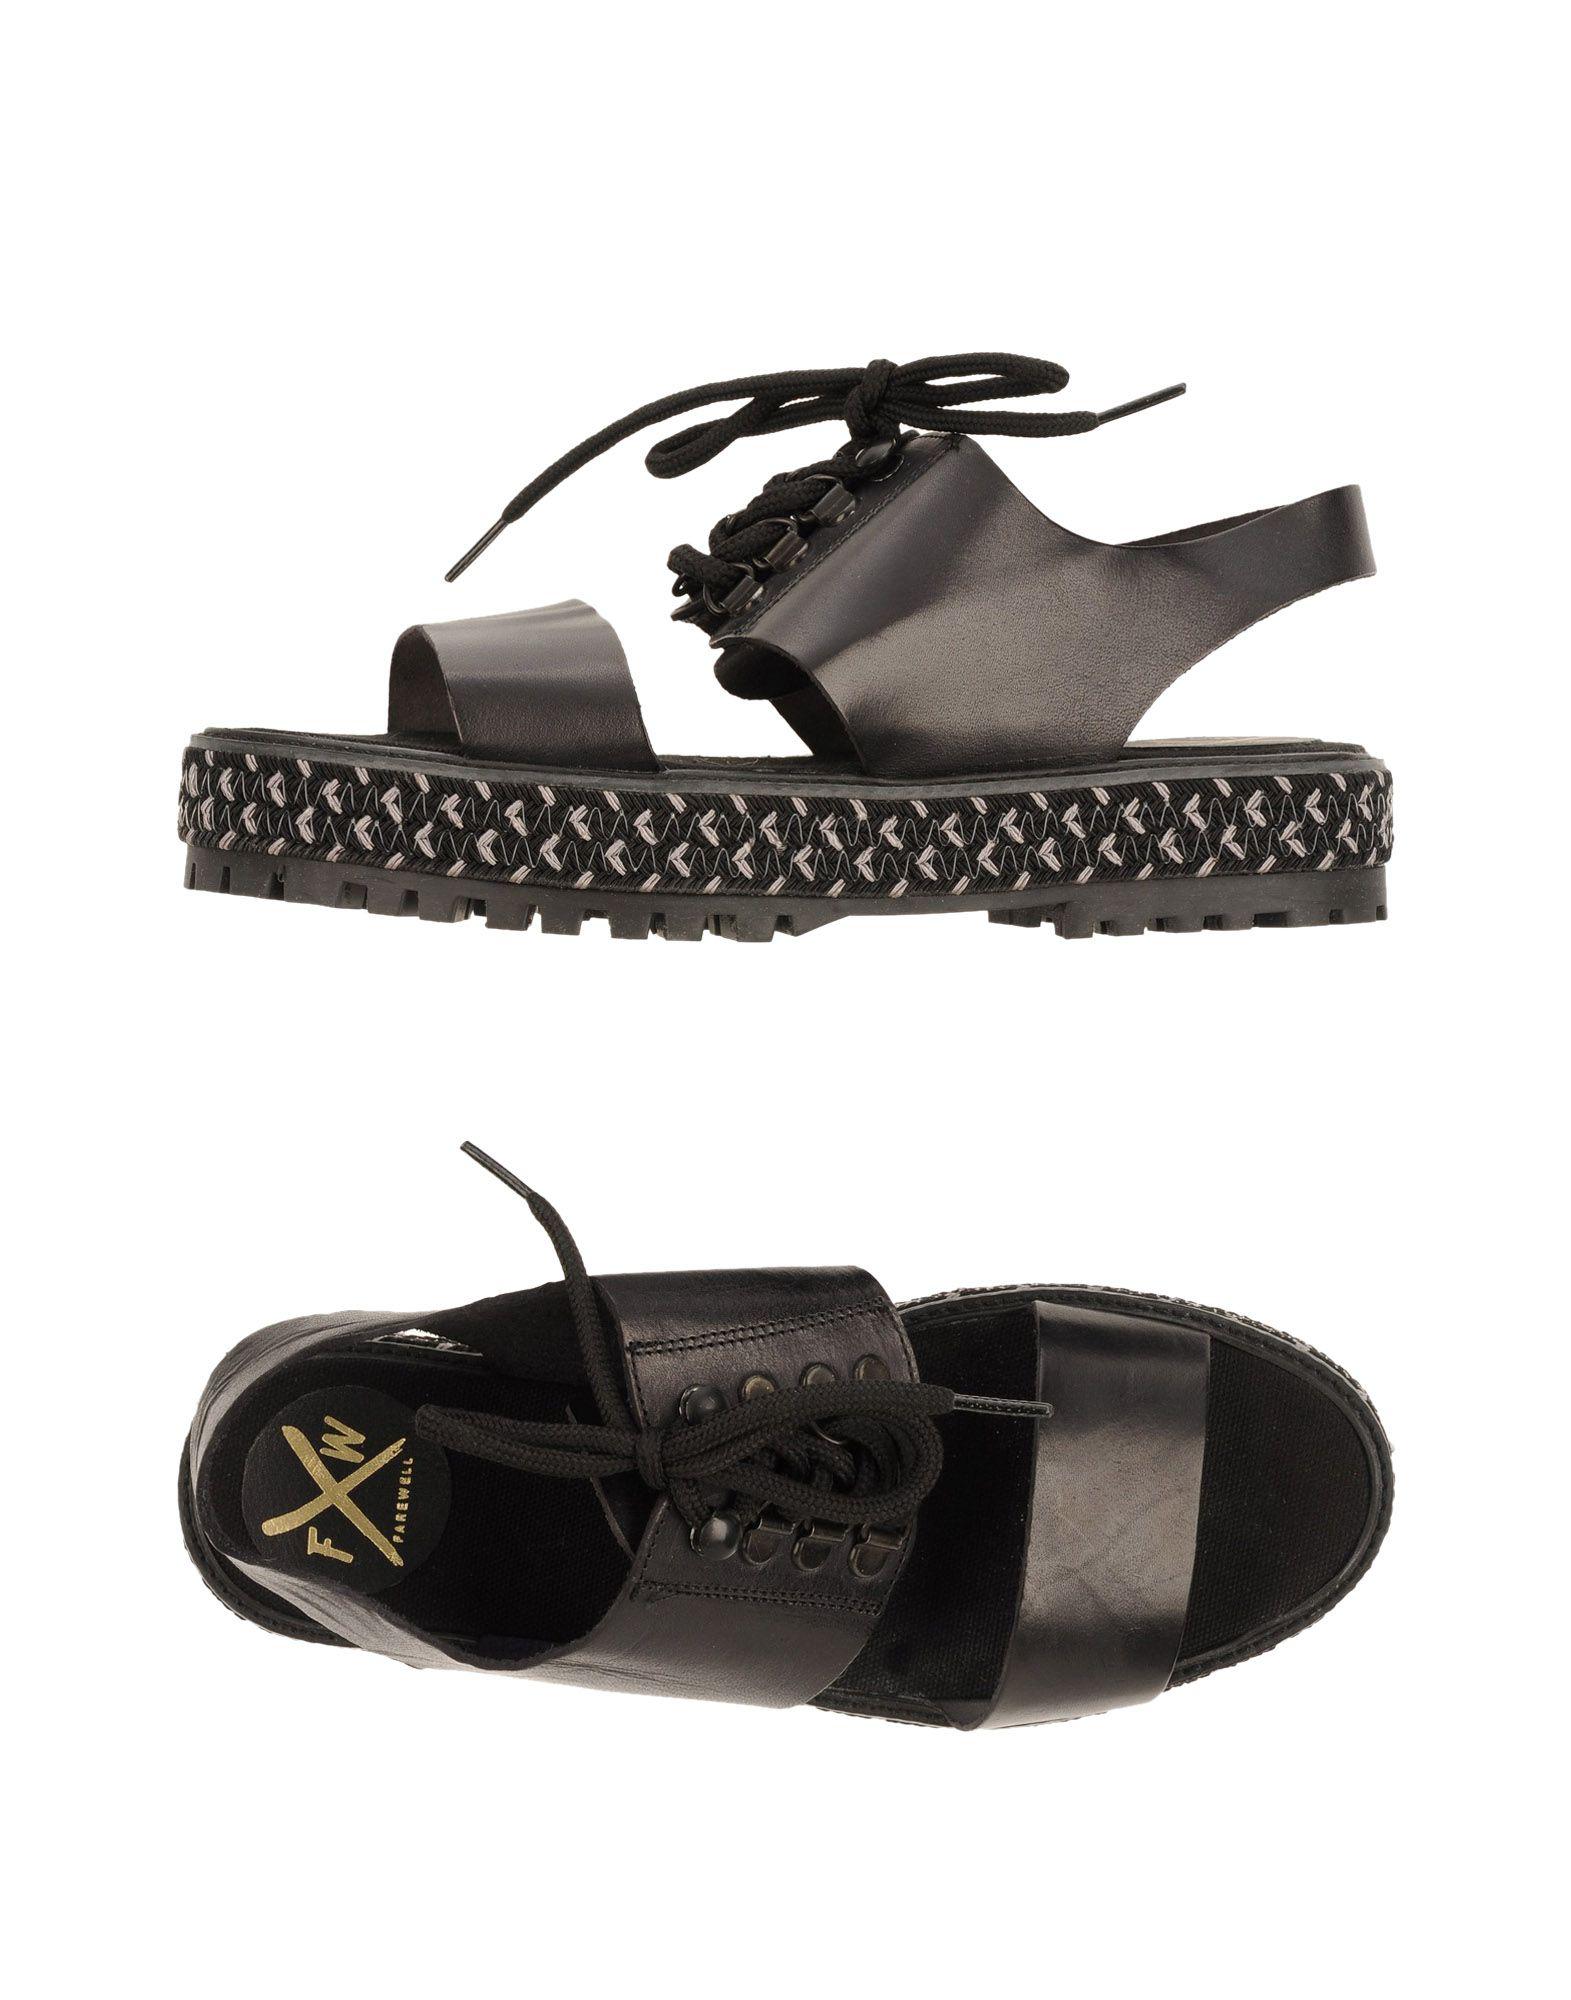 цены на FAREWELL  FOOTWEAR Сандалии в интернет-магазинах